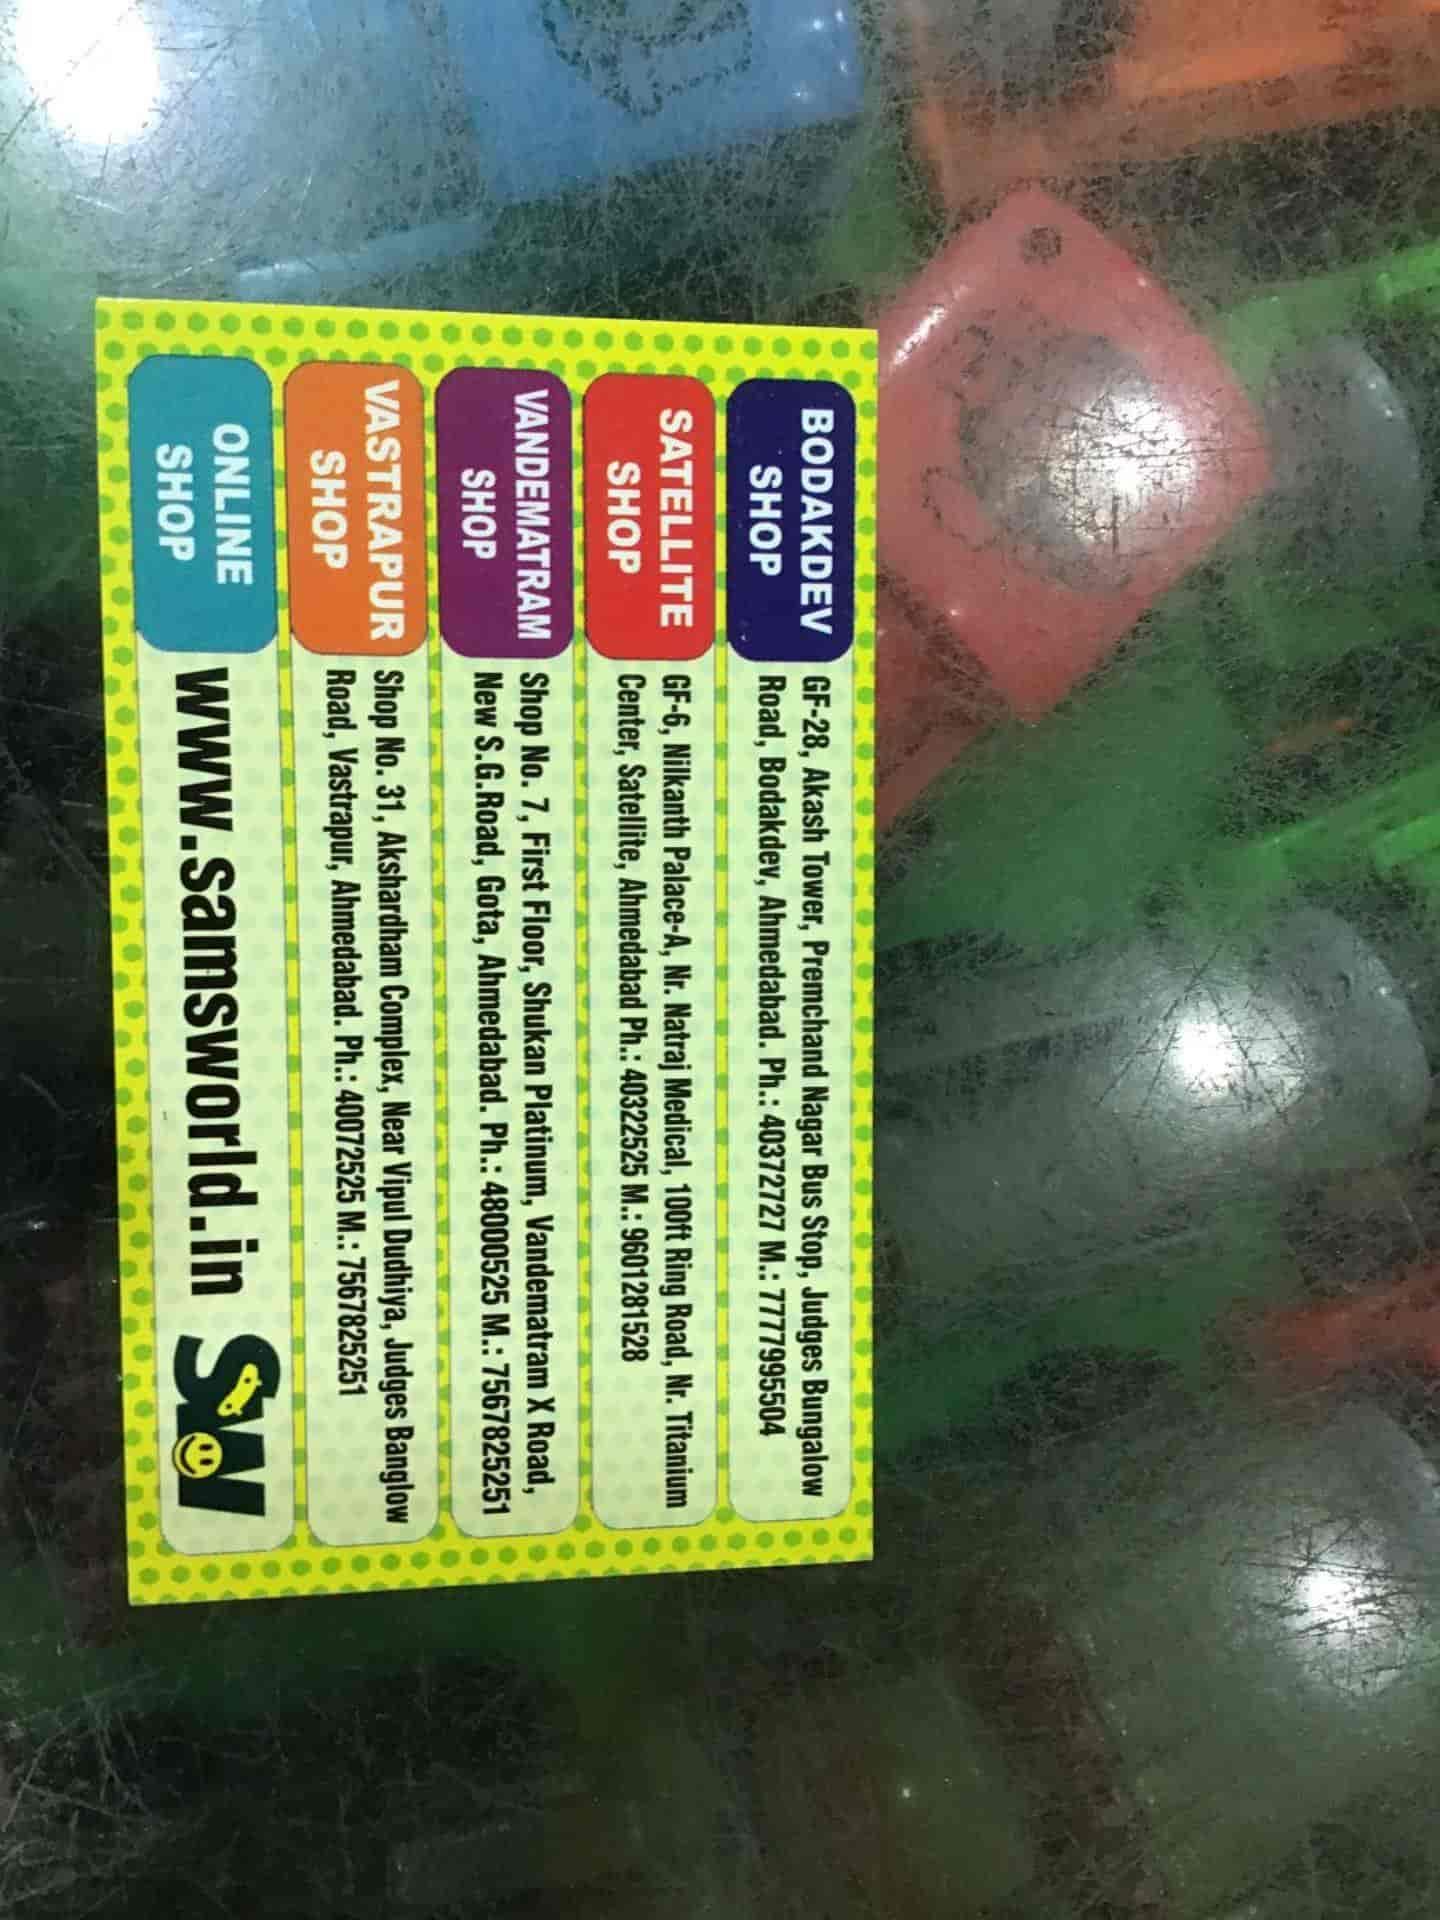 Sams Toy World, Satellite - Sports Goods Dealers in